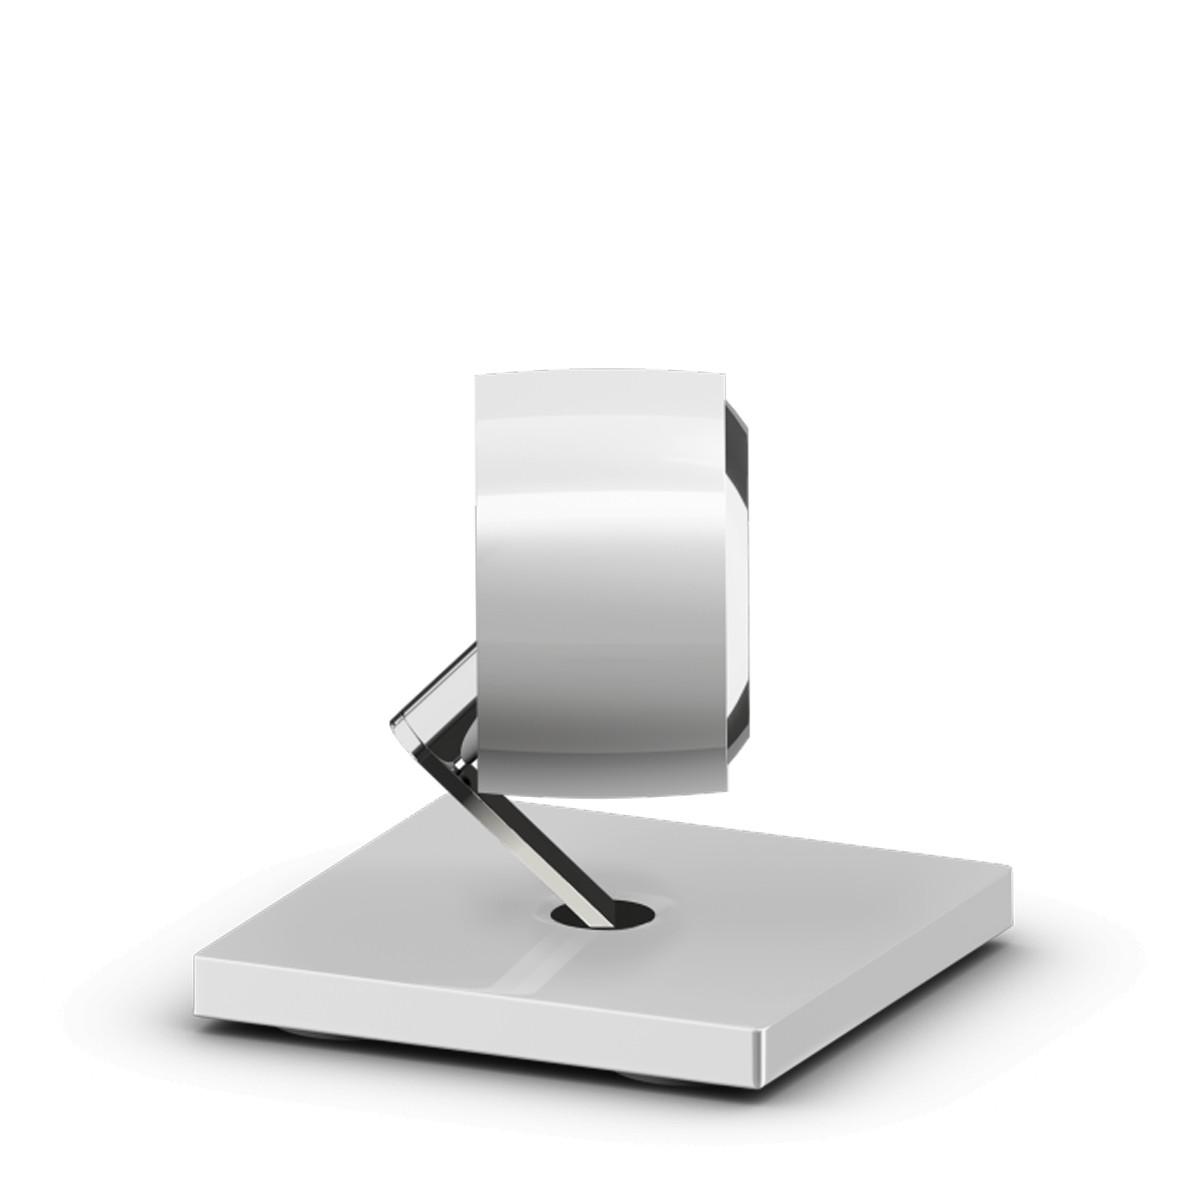 Occhio Più RS basso Bodenstrahler, 2700 K, weiß glänzend / Chrom